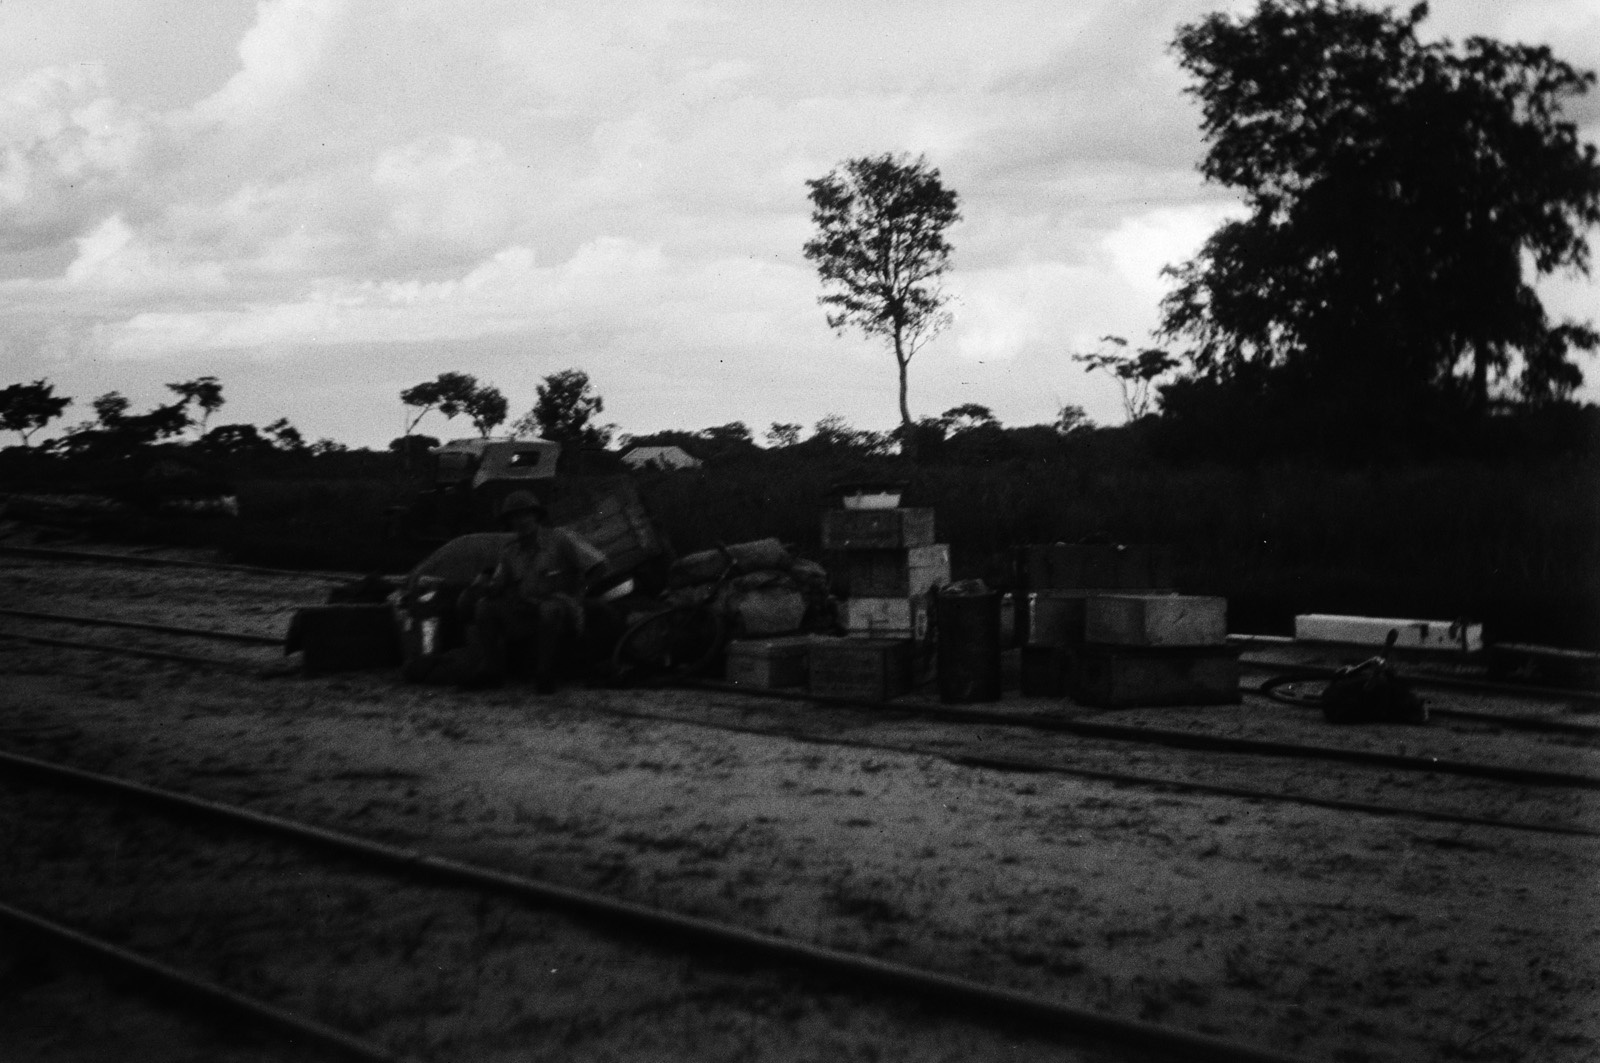 Капири Мпоши. Багаж экспедиции вокруг Эрнста Аккермана на станции